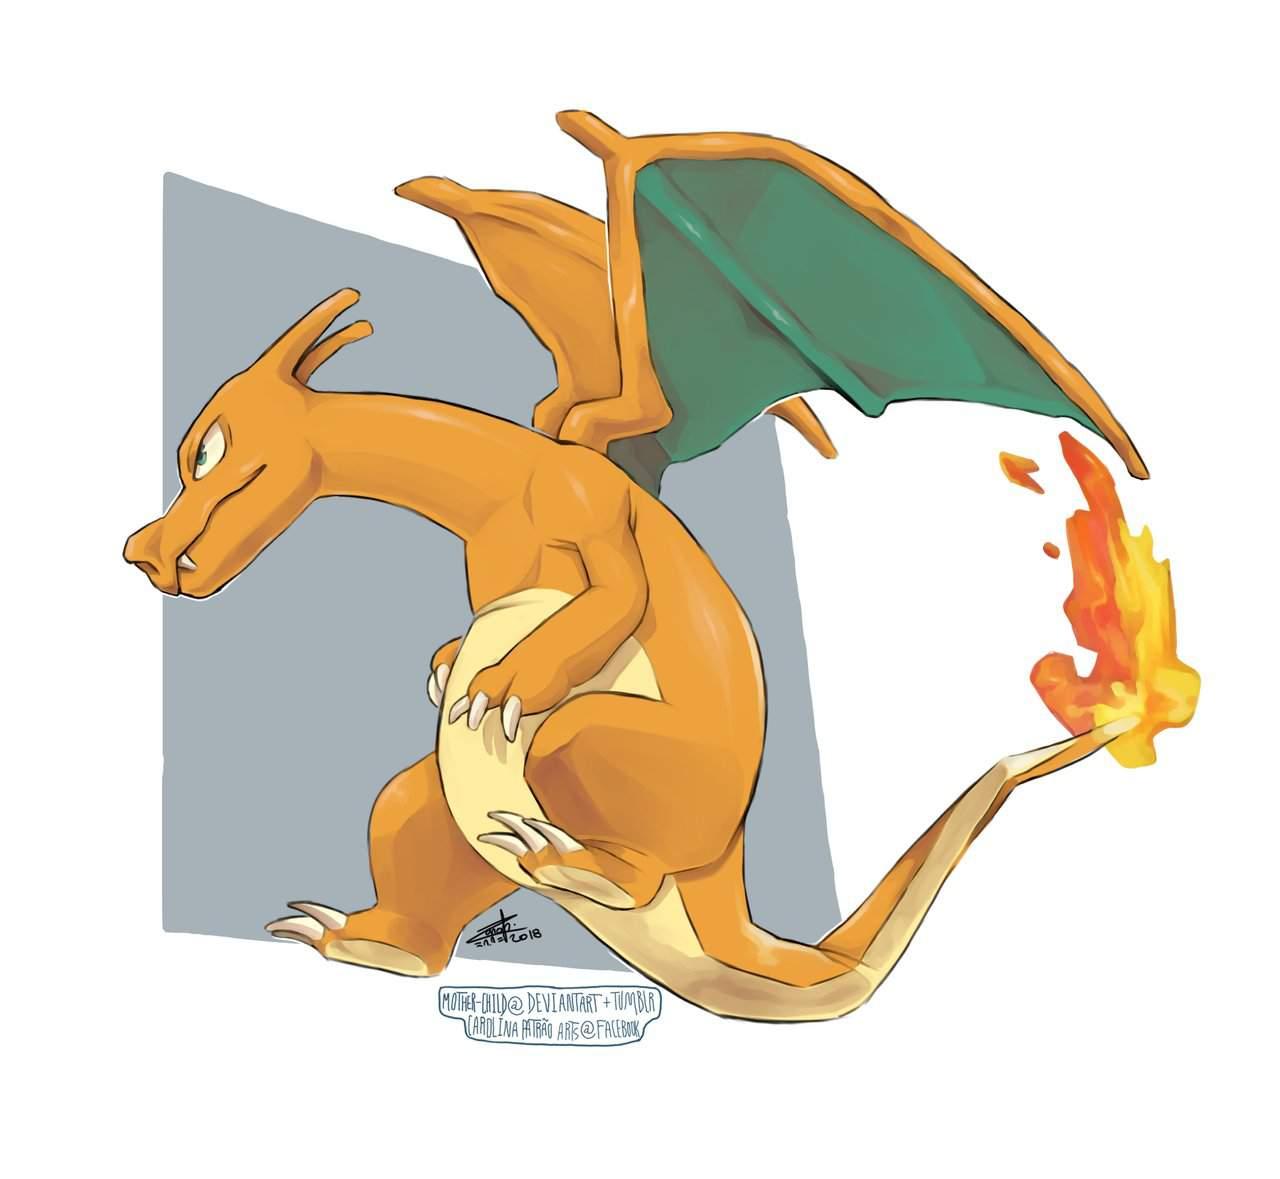 1280x1179 charizard and dragonite pokemon artdrawing amino amino